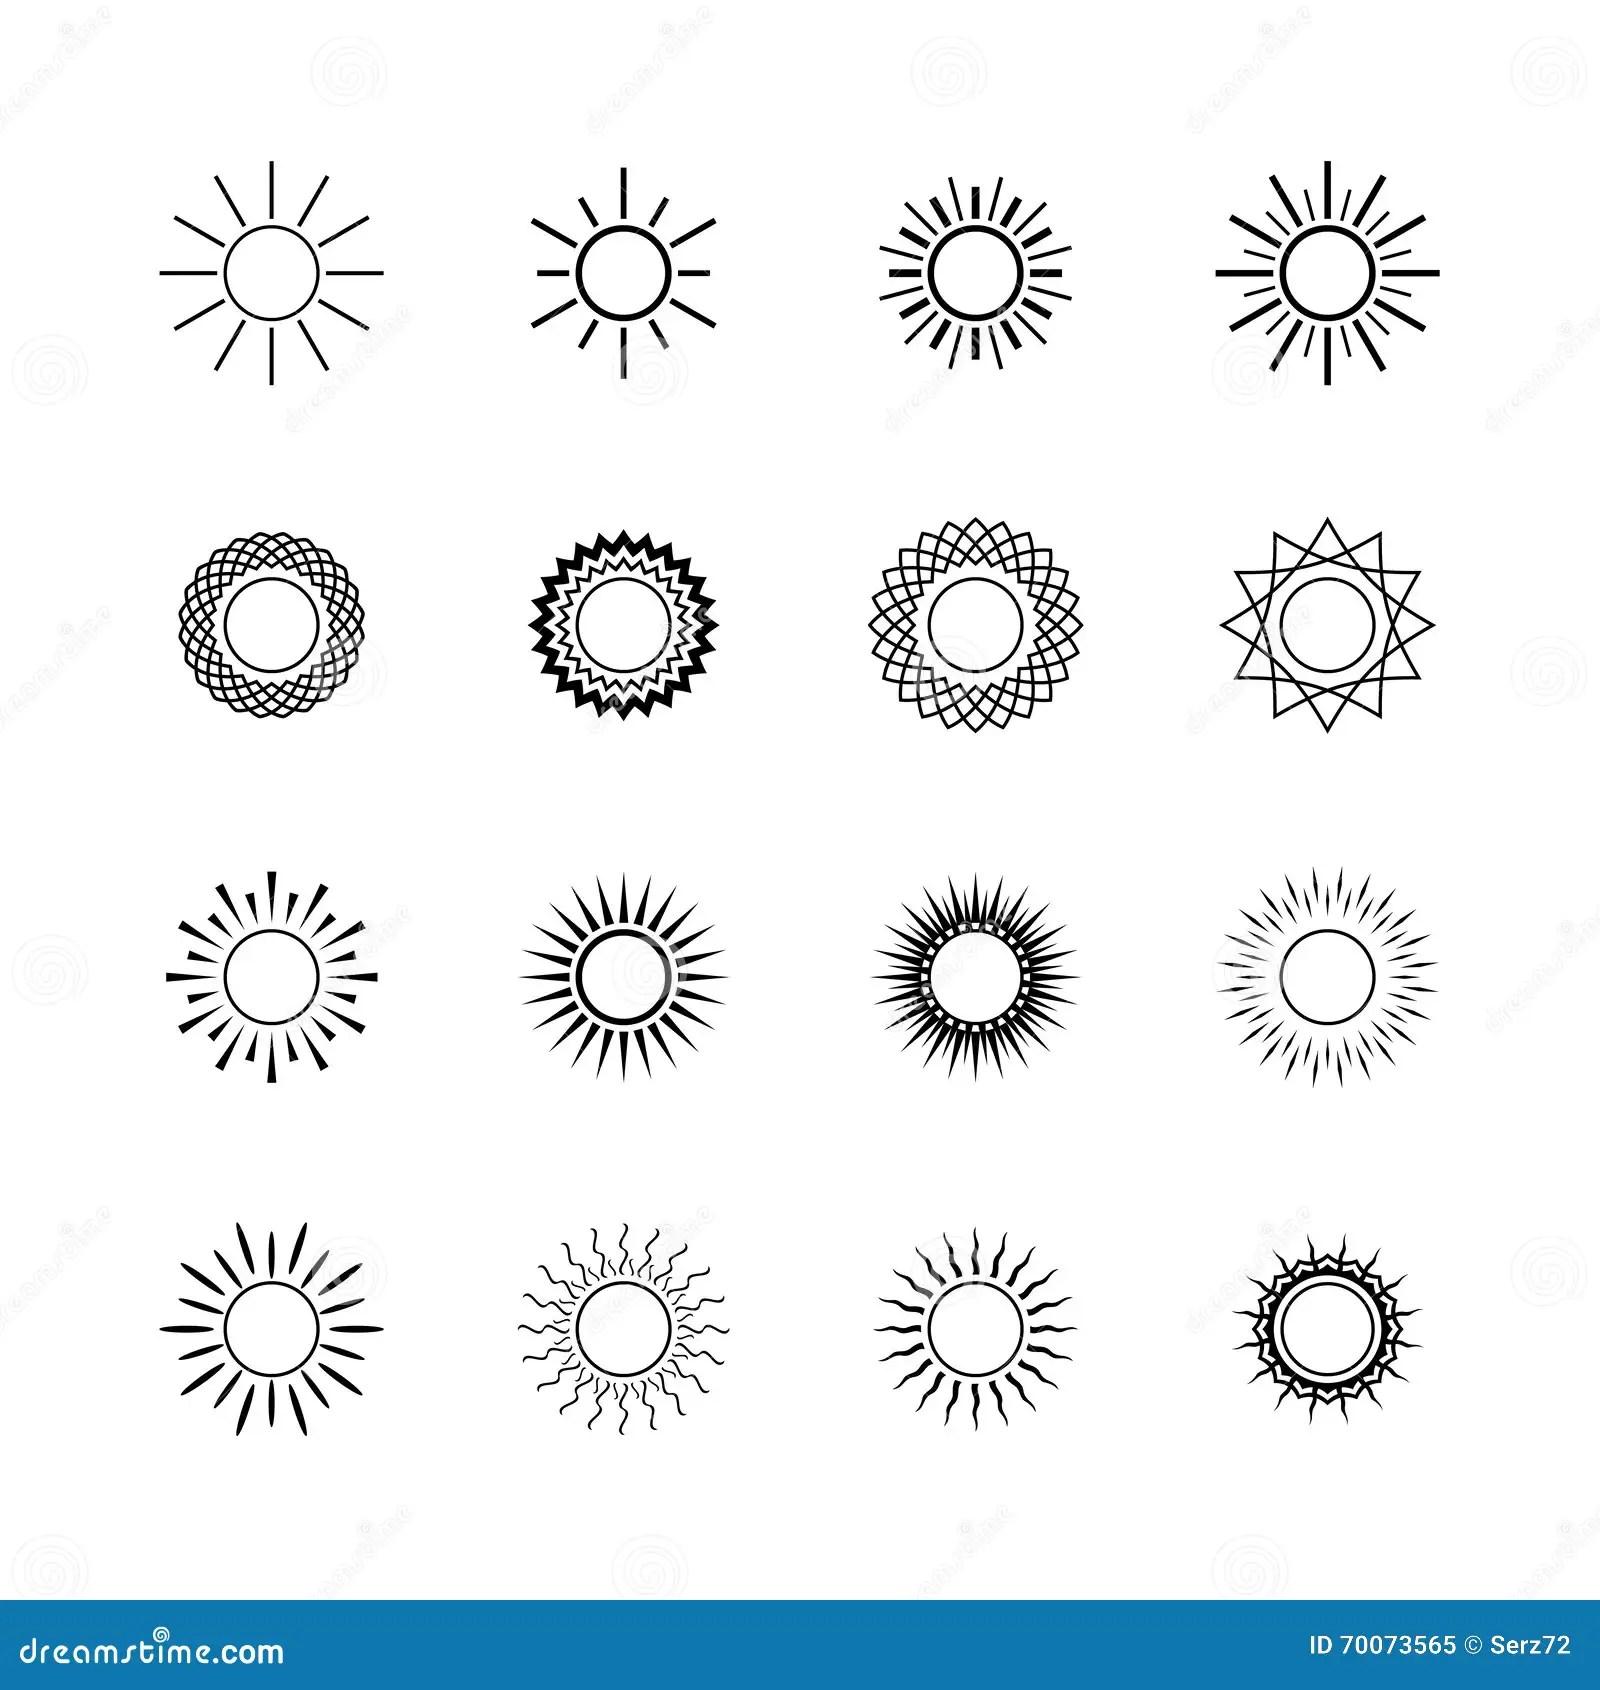 Instructional Design Icon